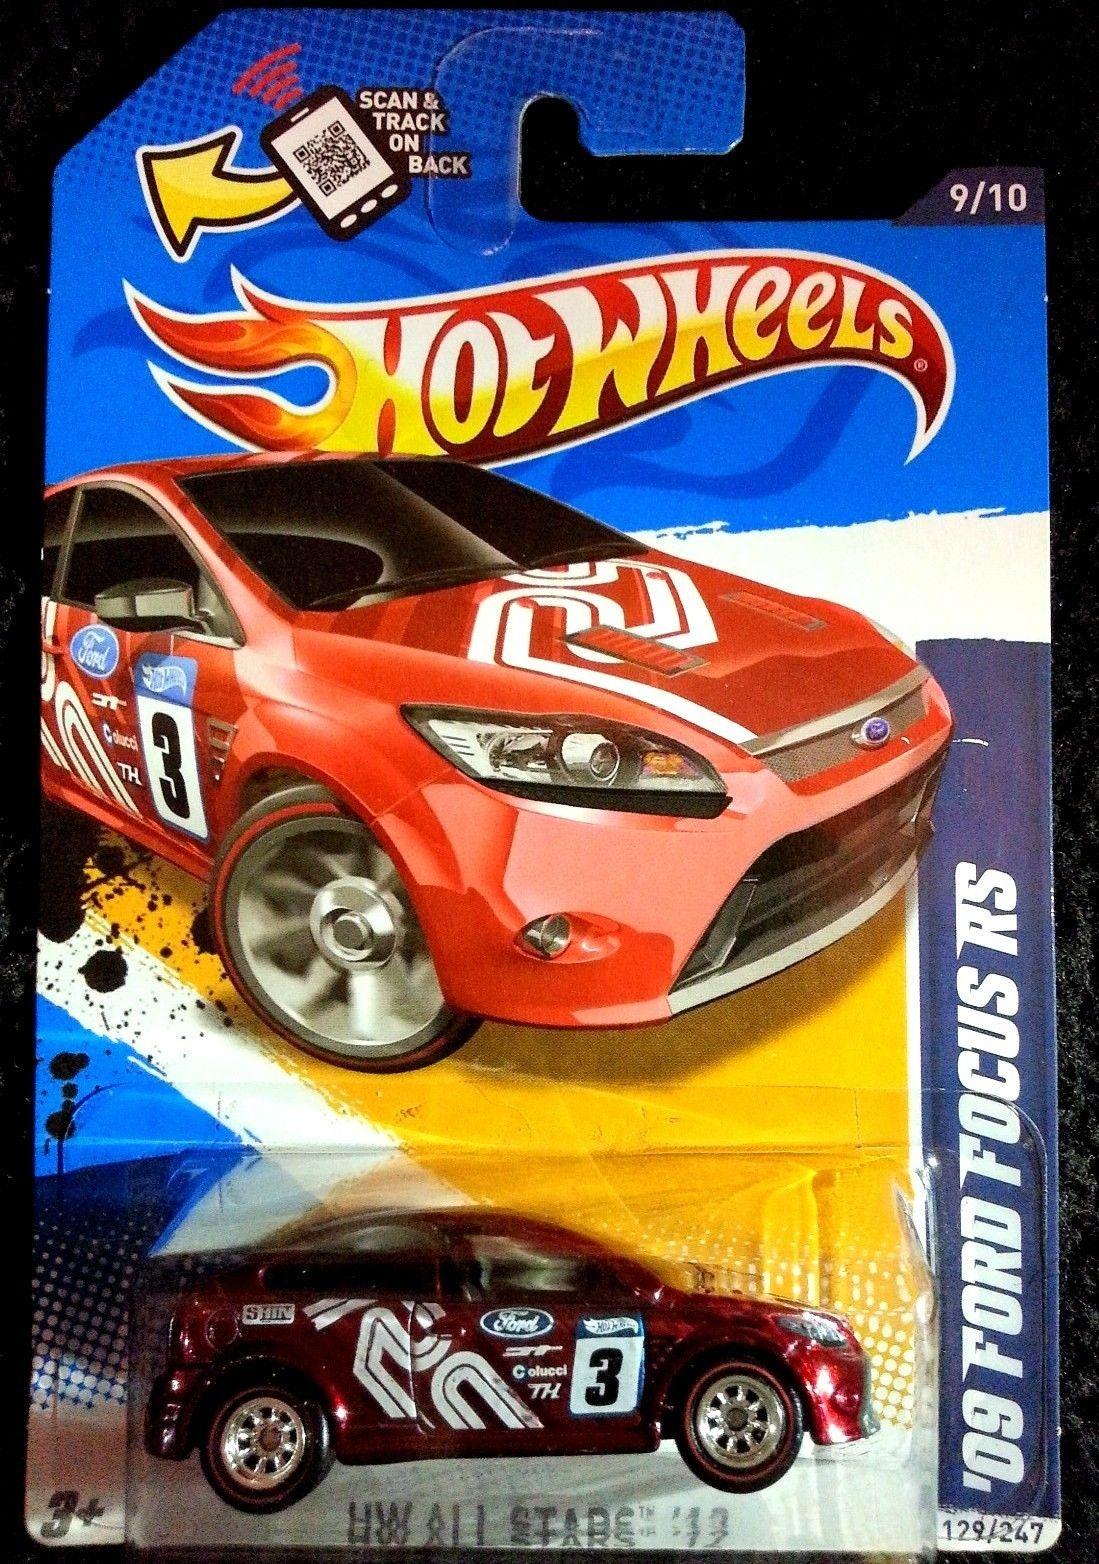 2012 Hot Wheels Super Treasure Hunt 09 Ford Focus Rs Hot Wheels Toys Hot Wheels Hot Wheels Cars